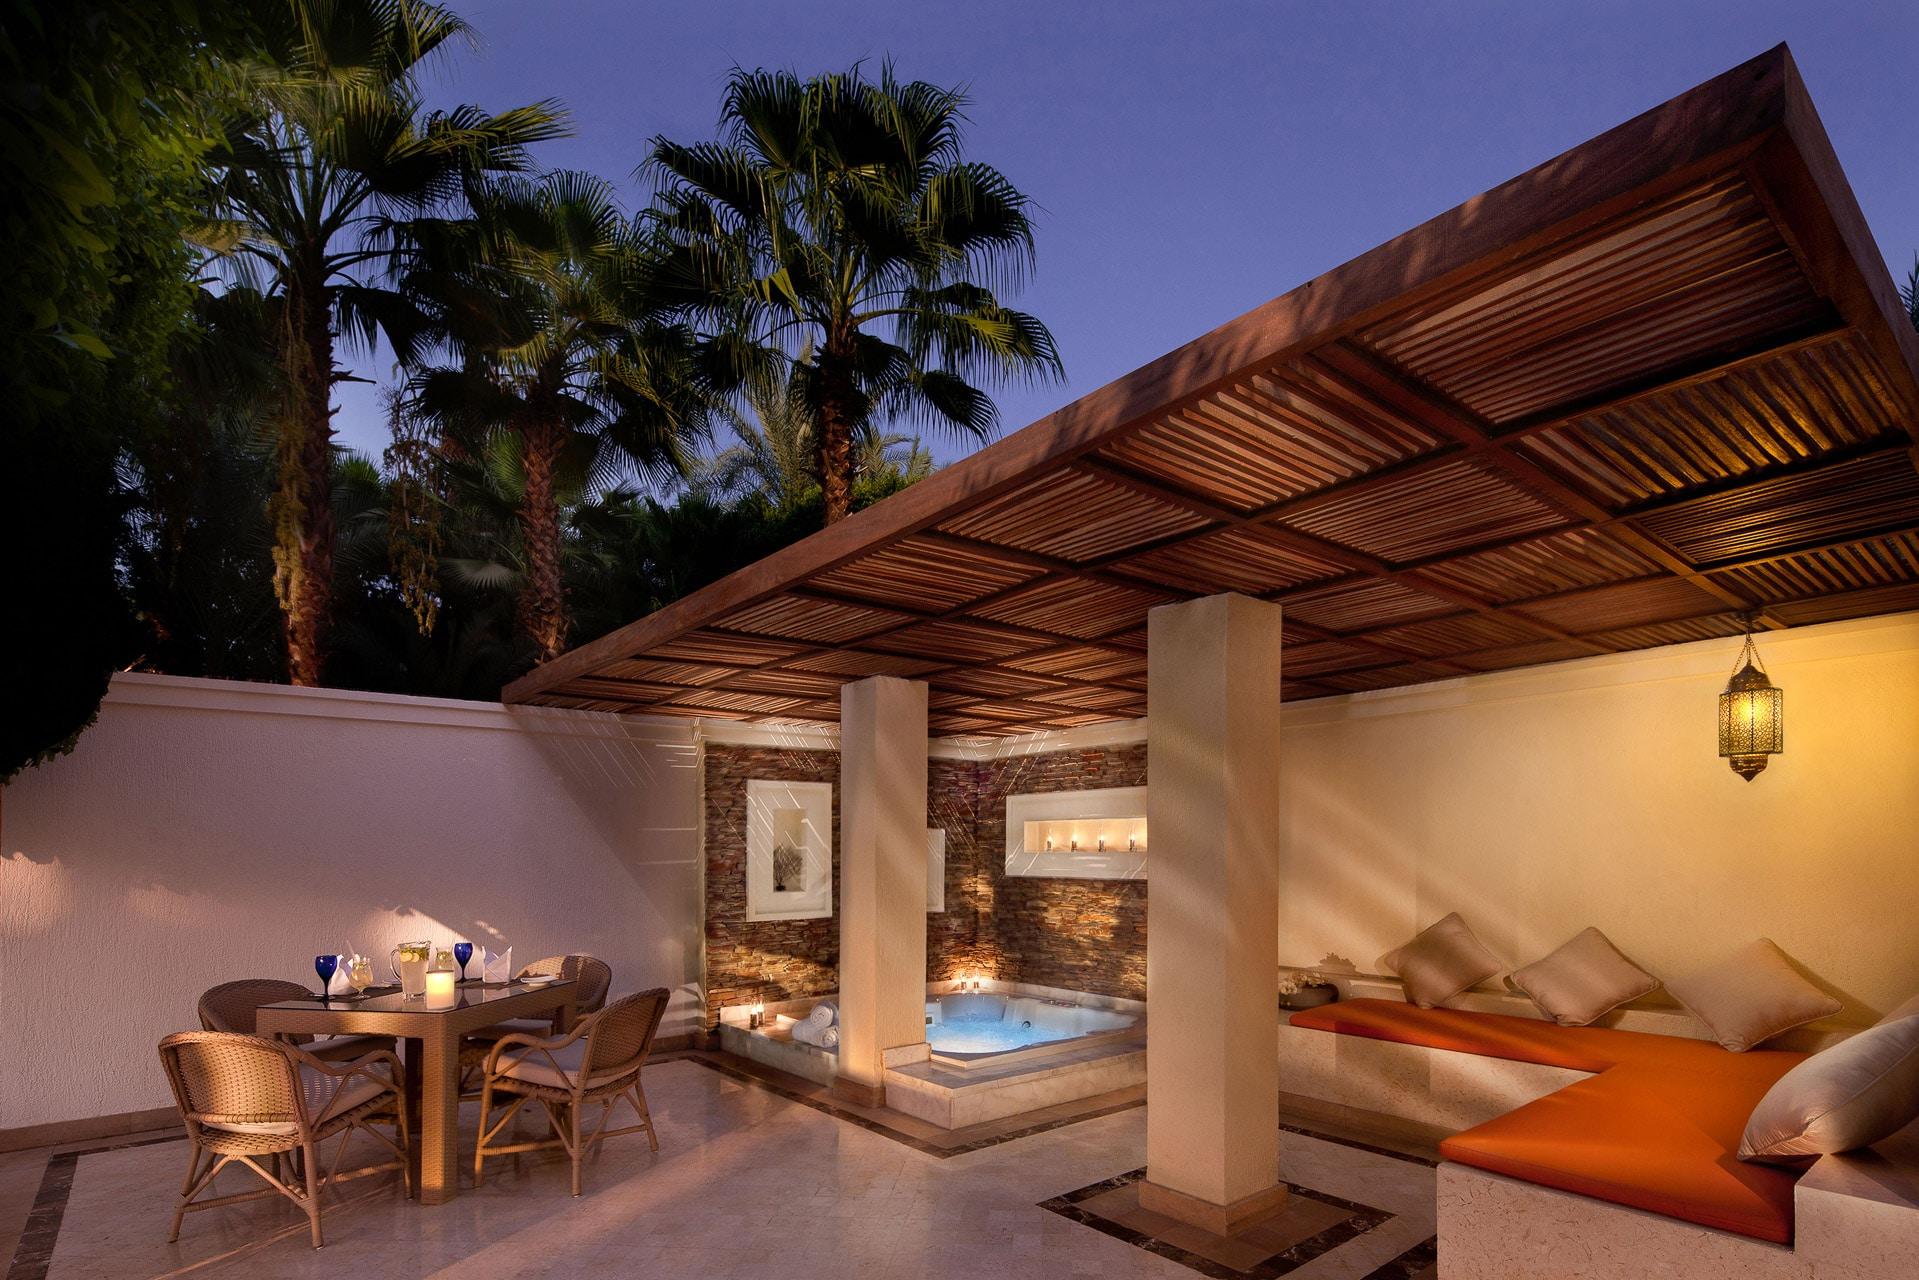 Hilton-Luxor-Resort-Aegypten-11